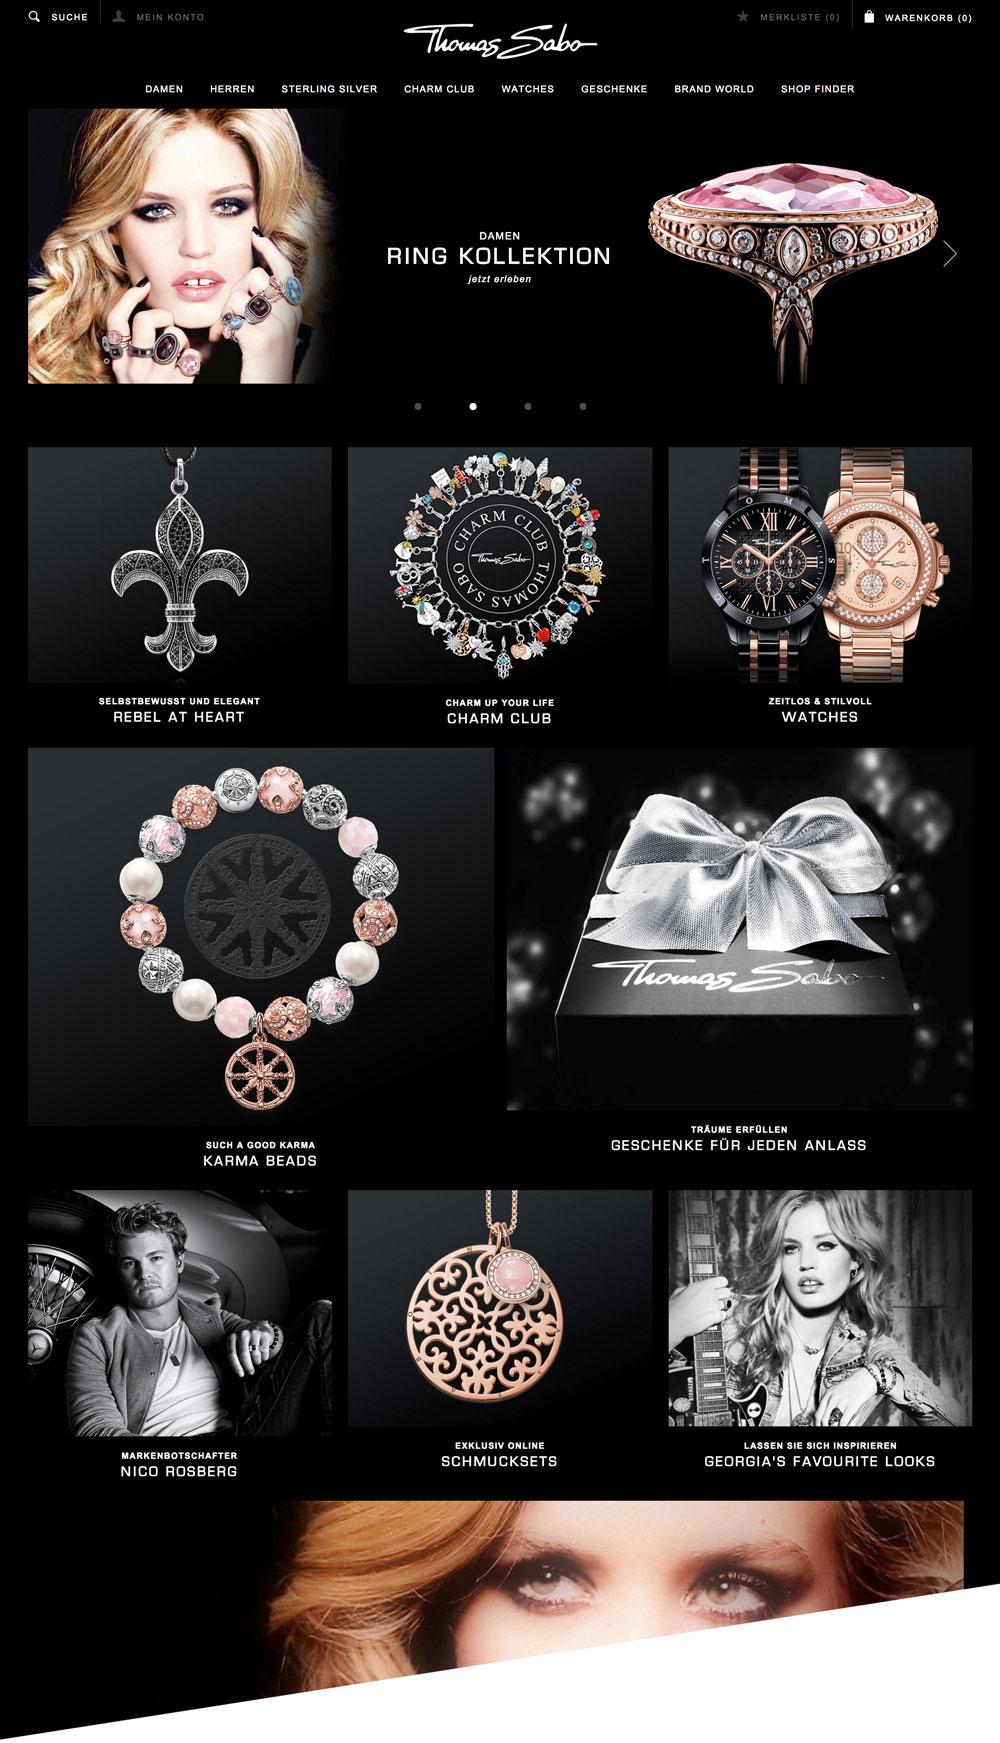 Thomas-Sabo-Online-Store-Homepage